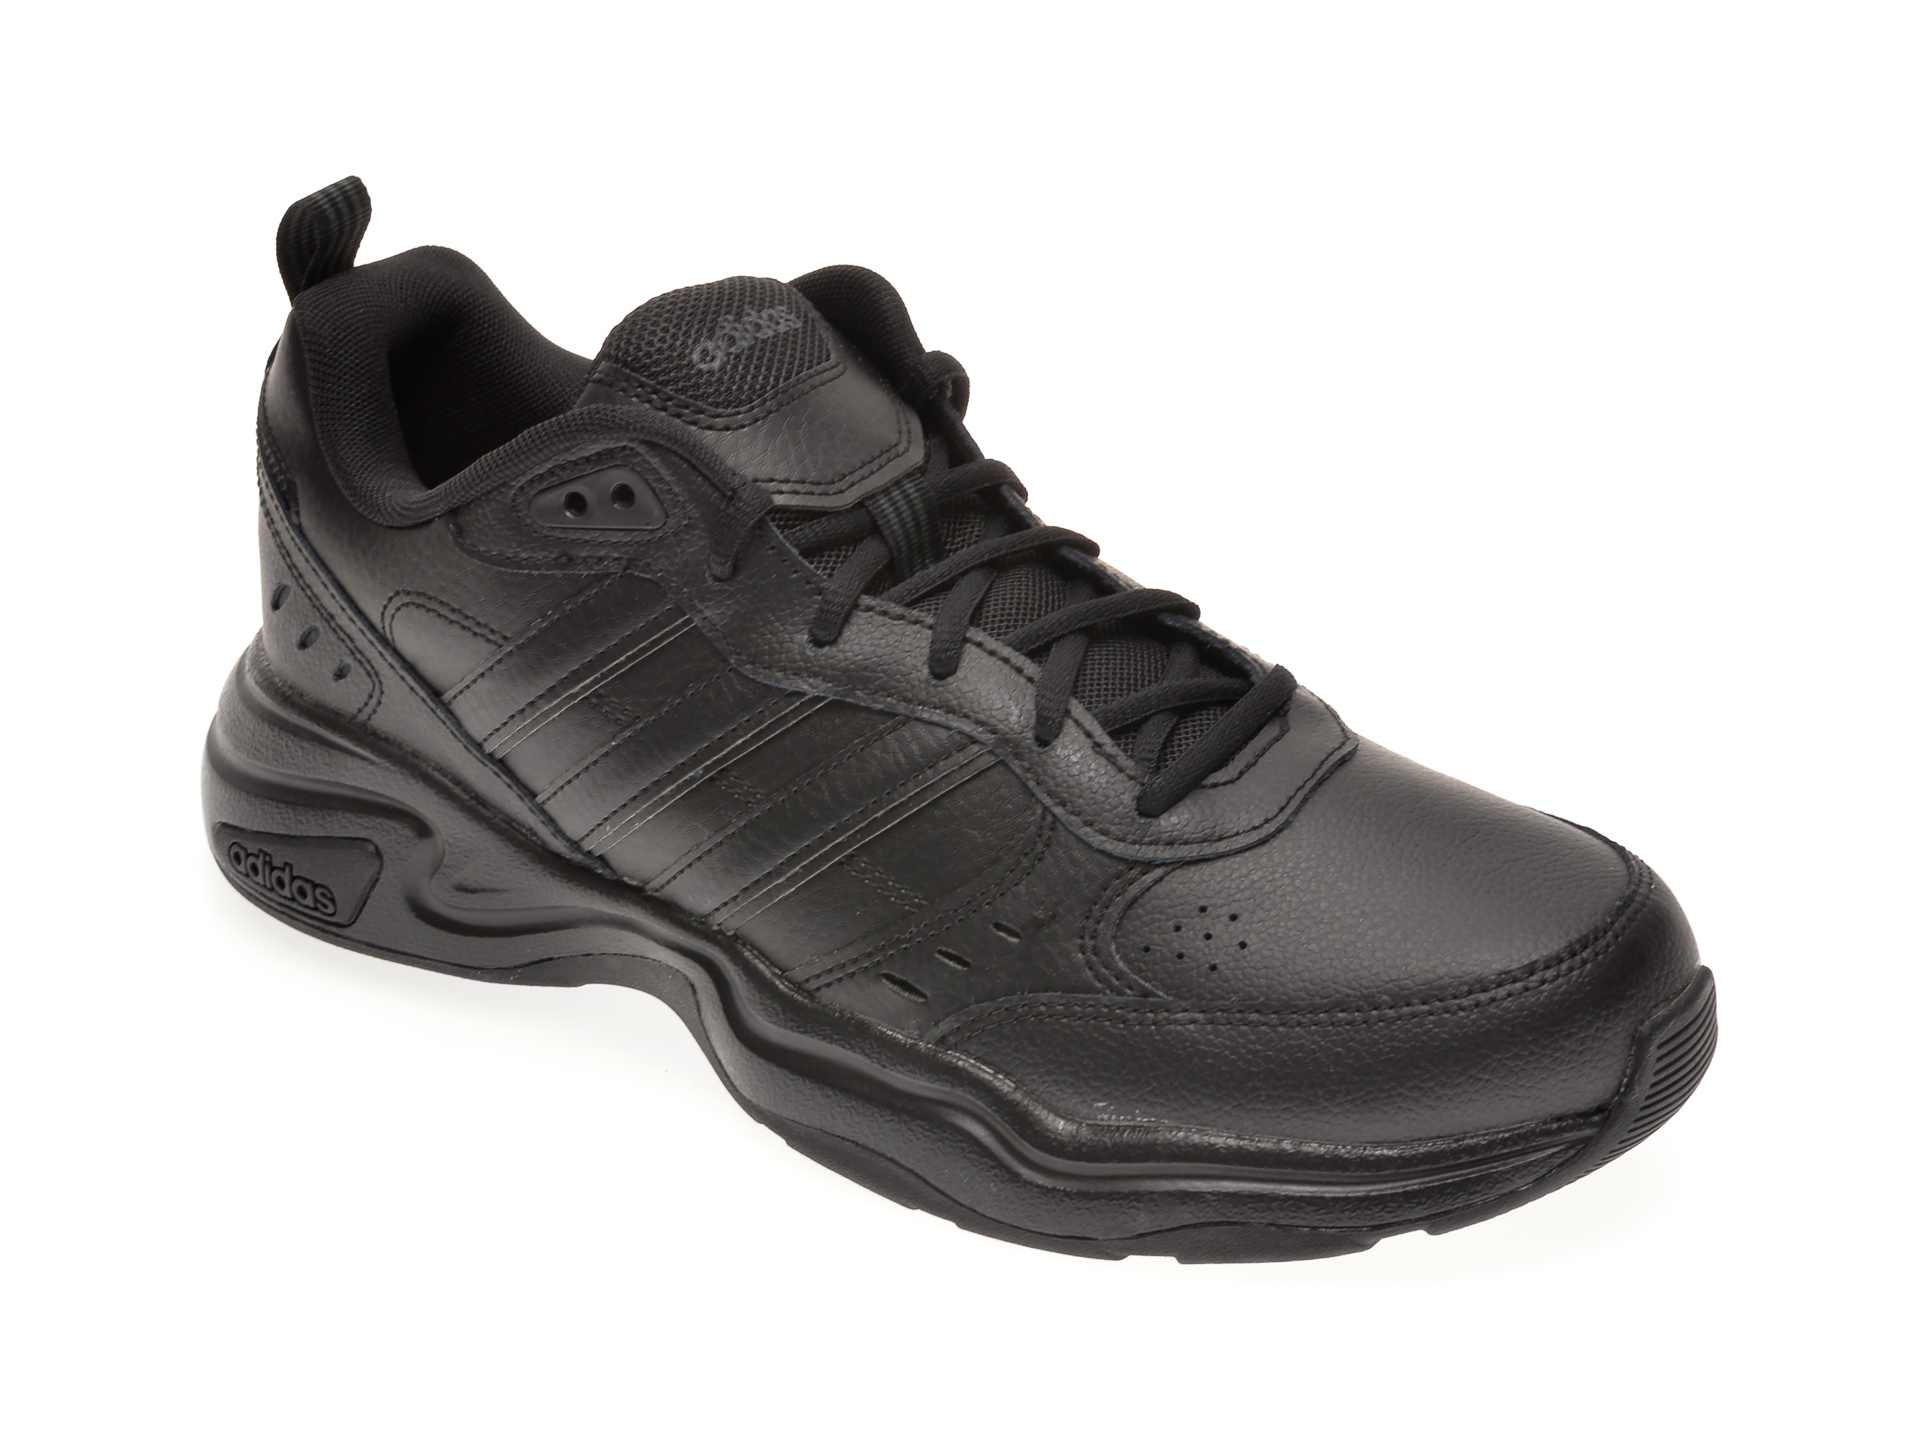 Pantofi ADIDAS negri, STRUTTER, din piele naturala